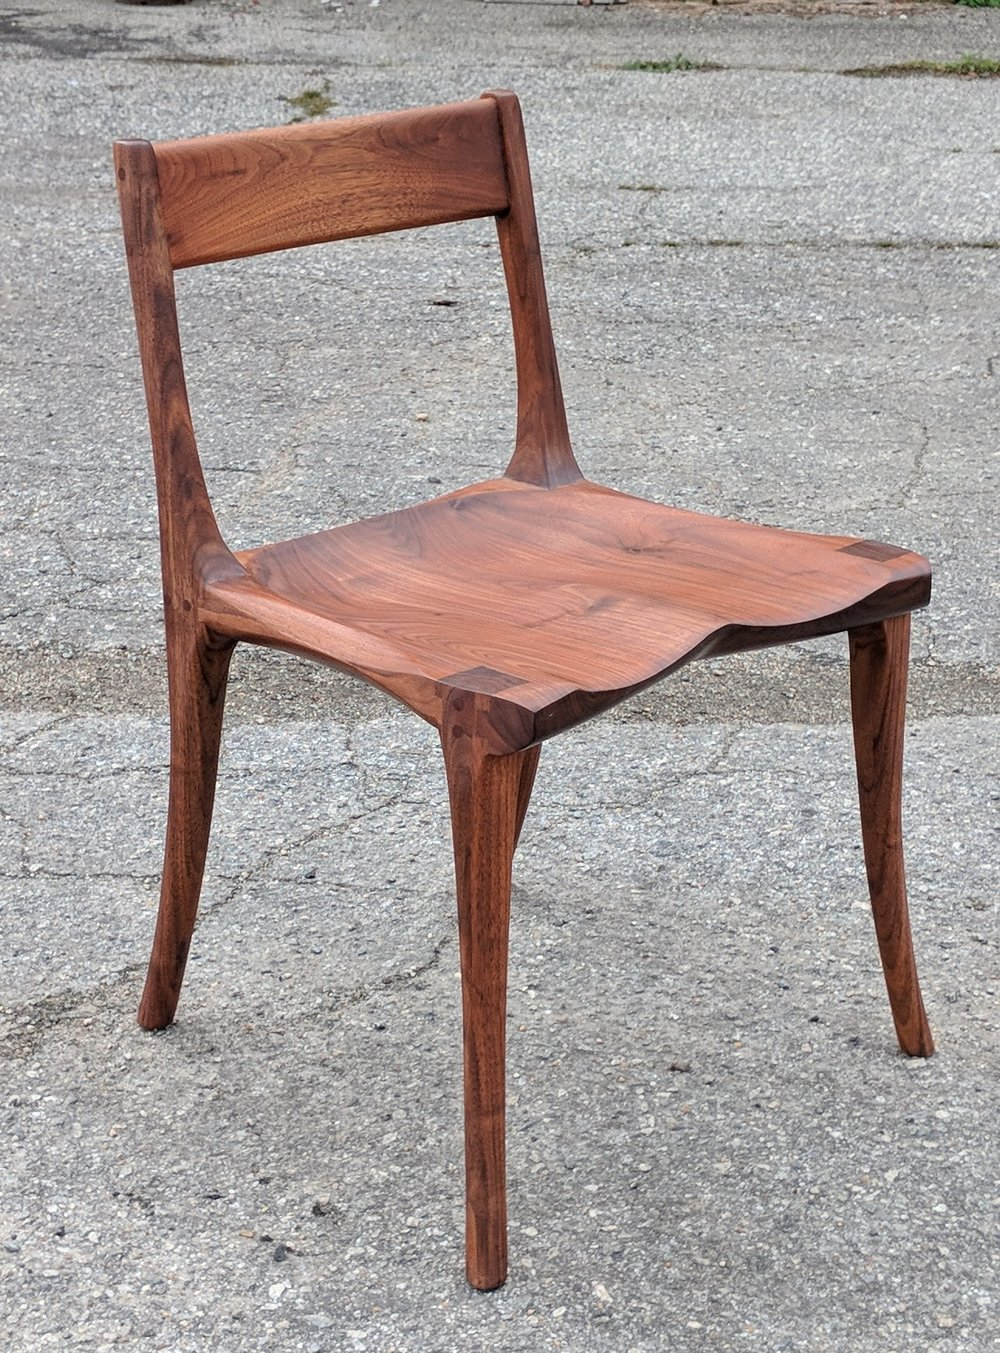 walnut desk chair2.jpg